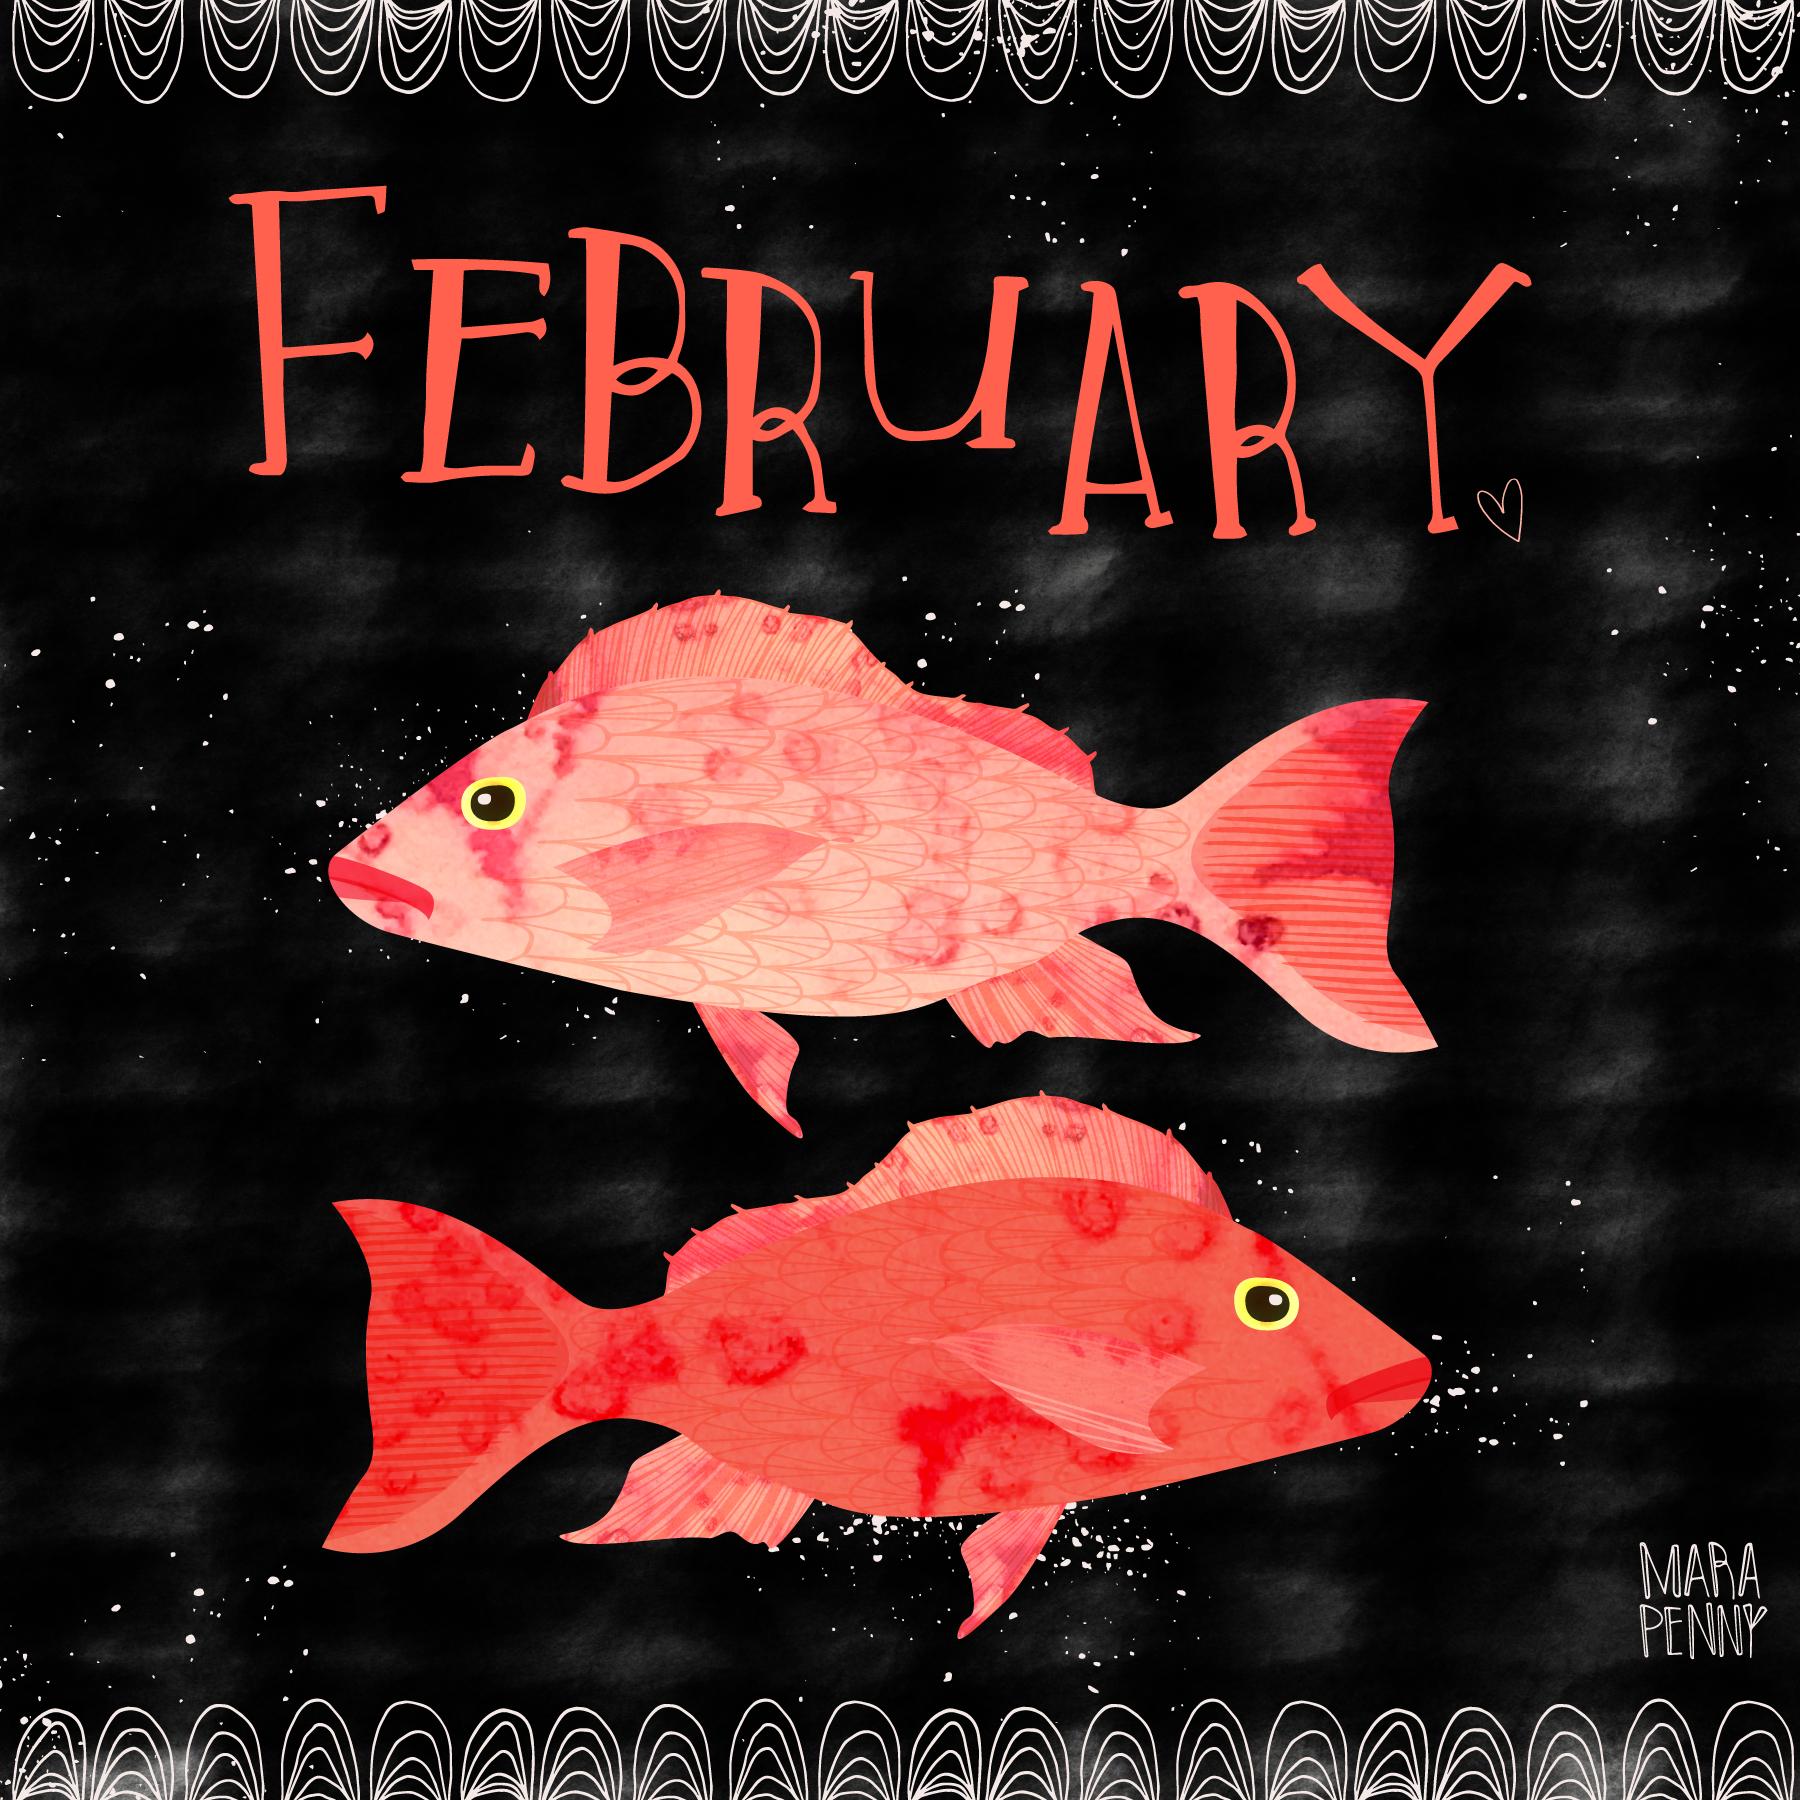 FEBRUARY-Fish.jpg